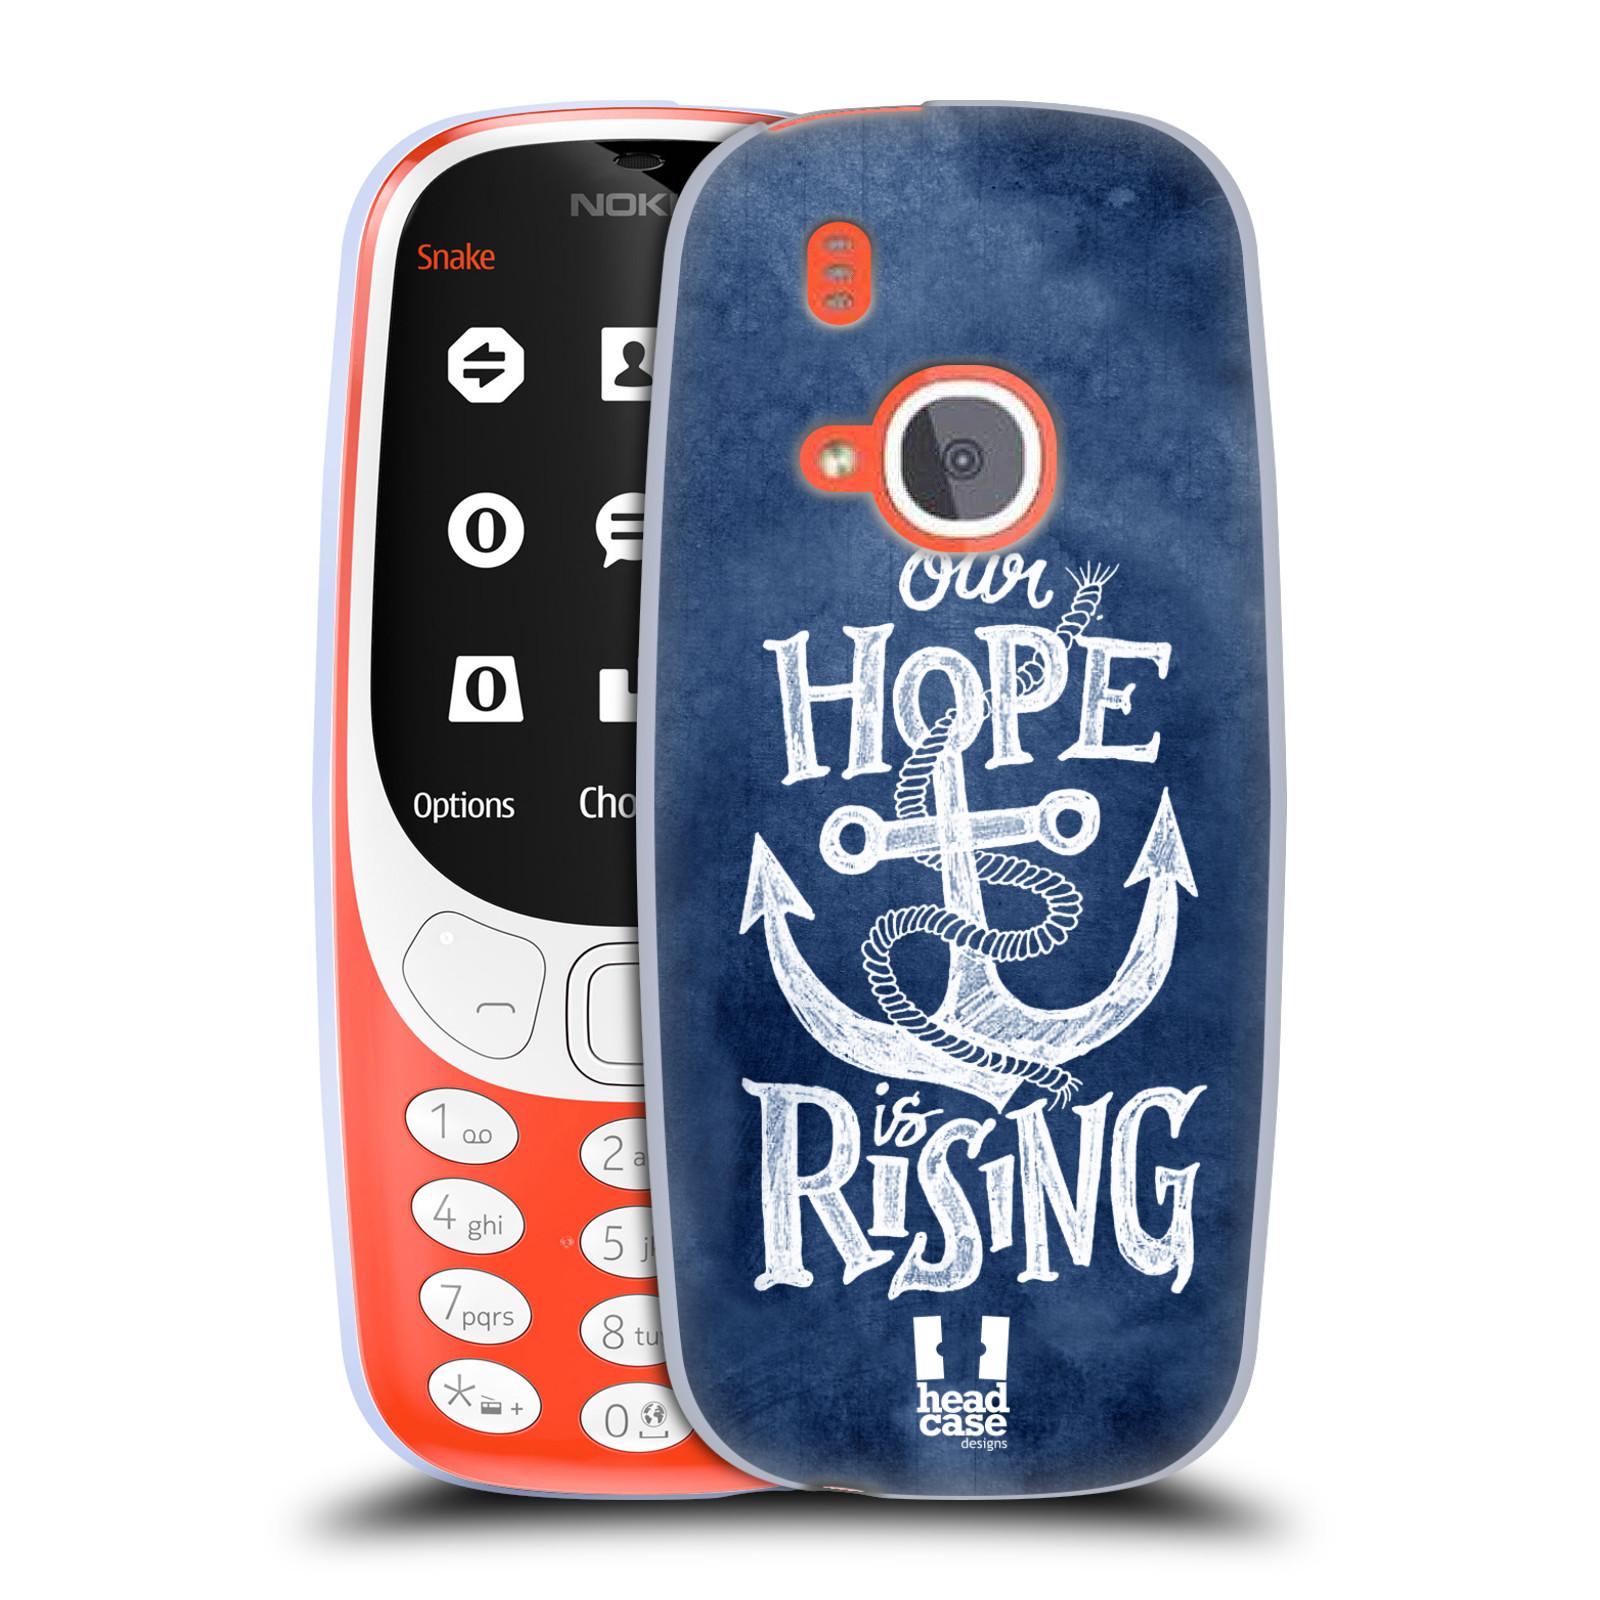 Silikonové pouzdro na mobil Nokia 3310 - Head Case - KOTVA RISING